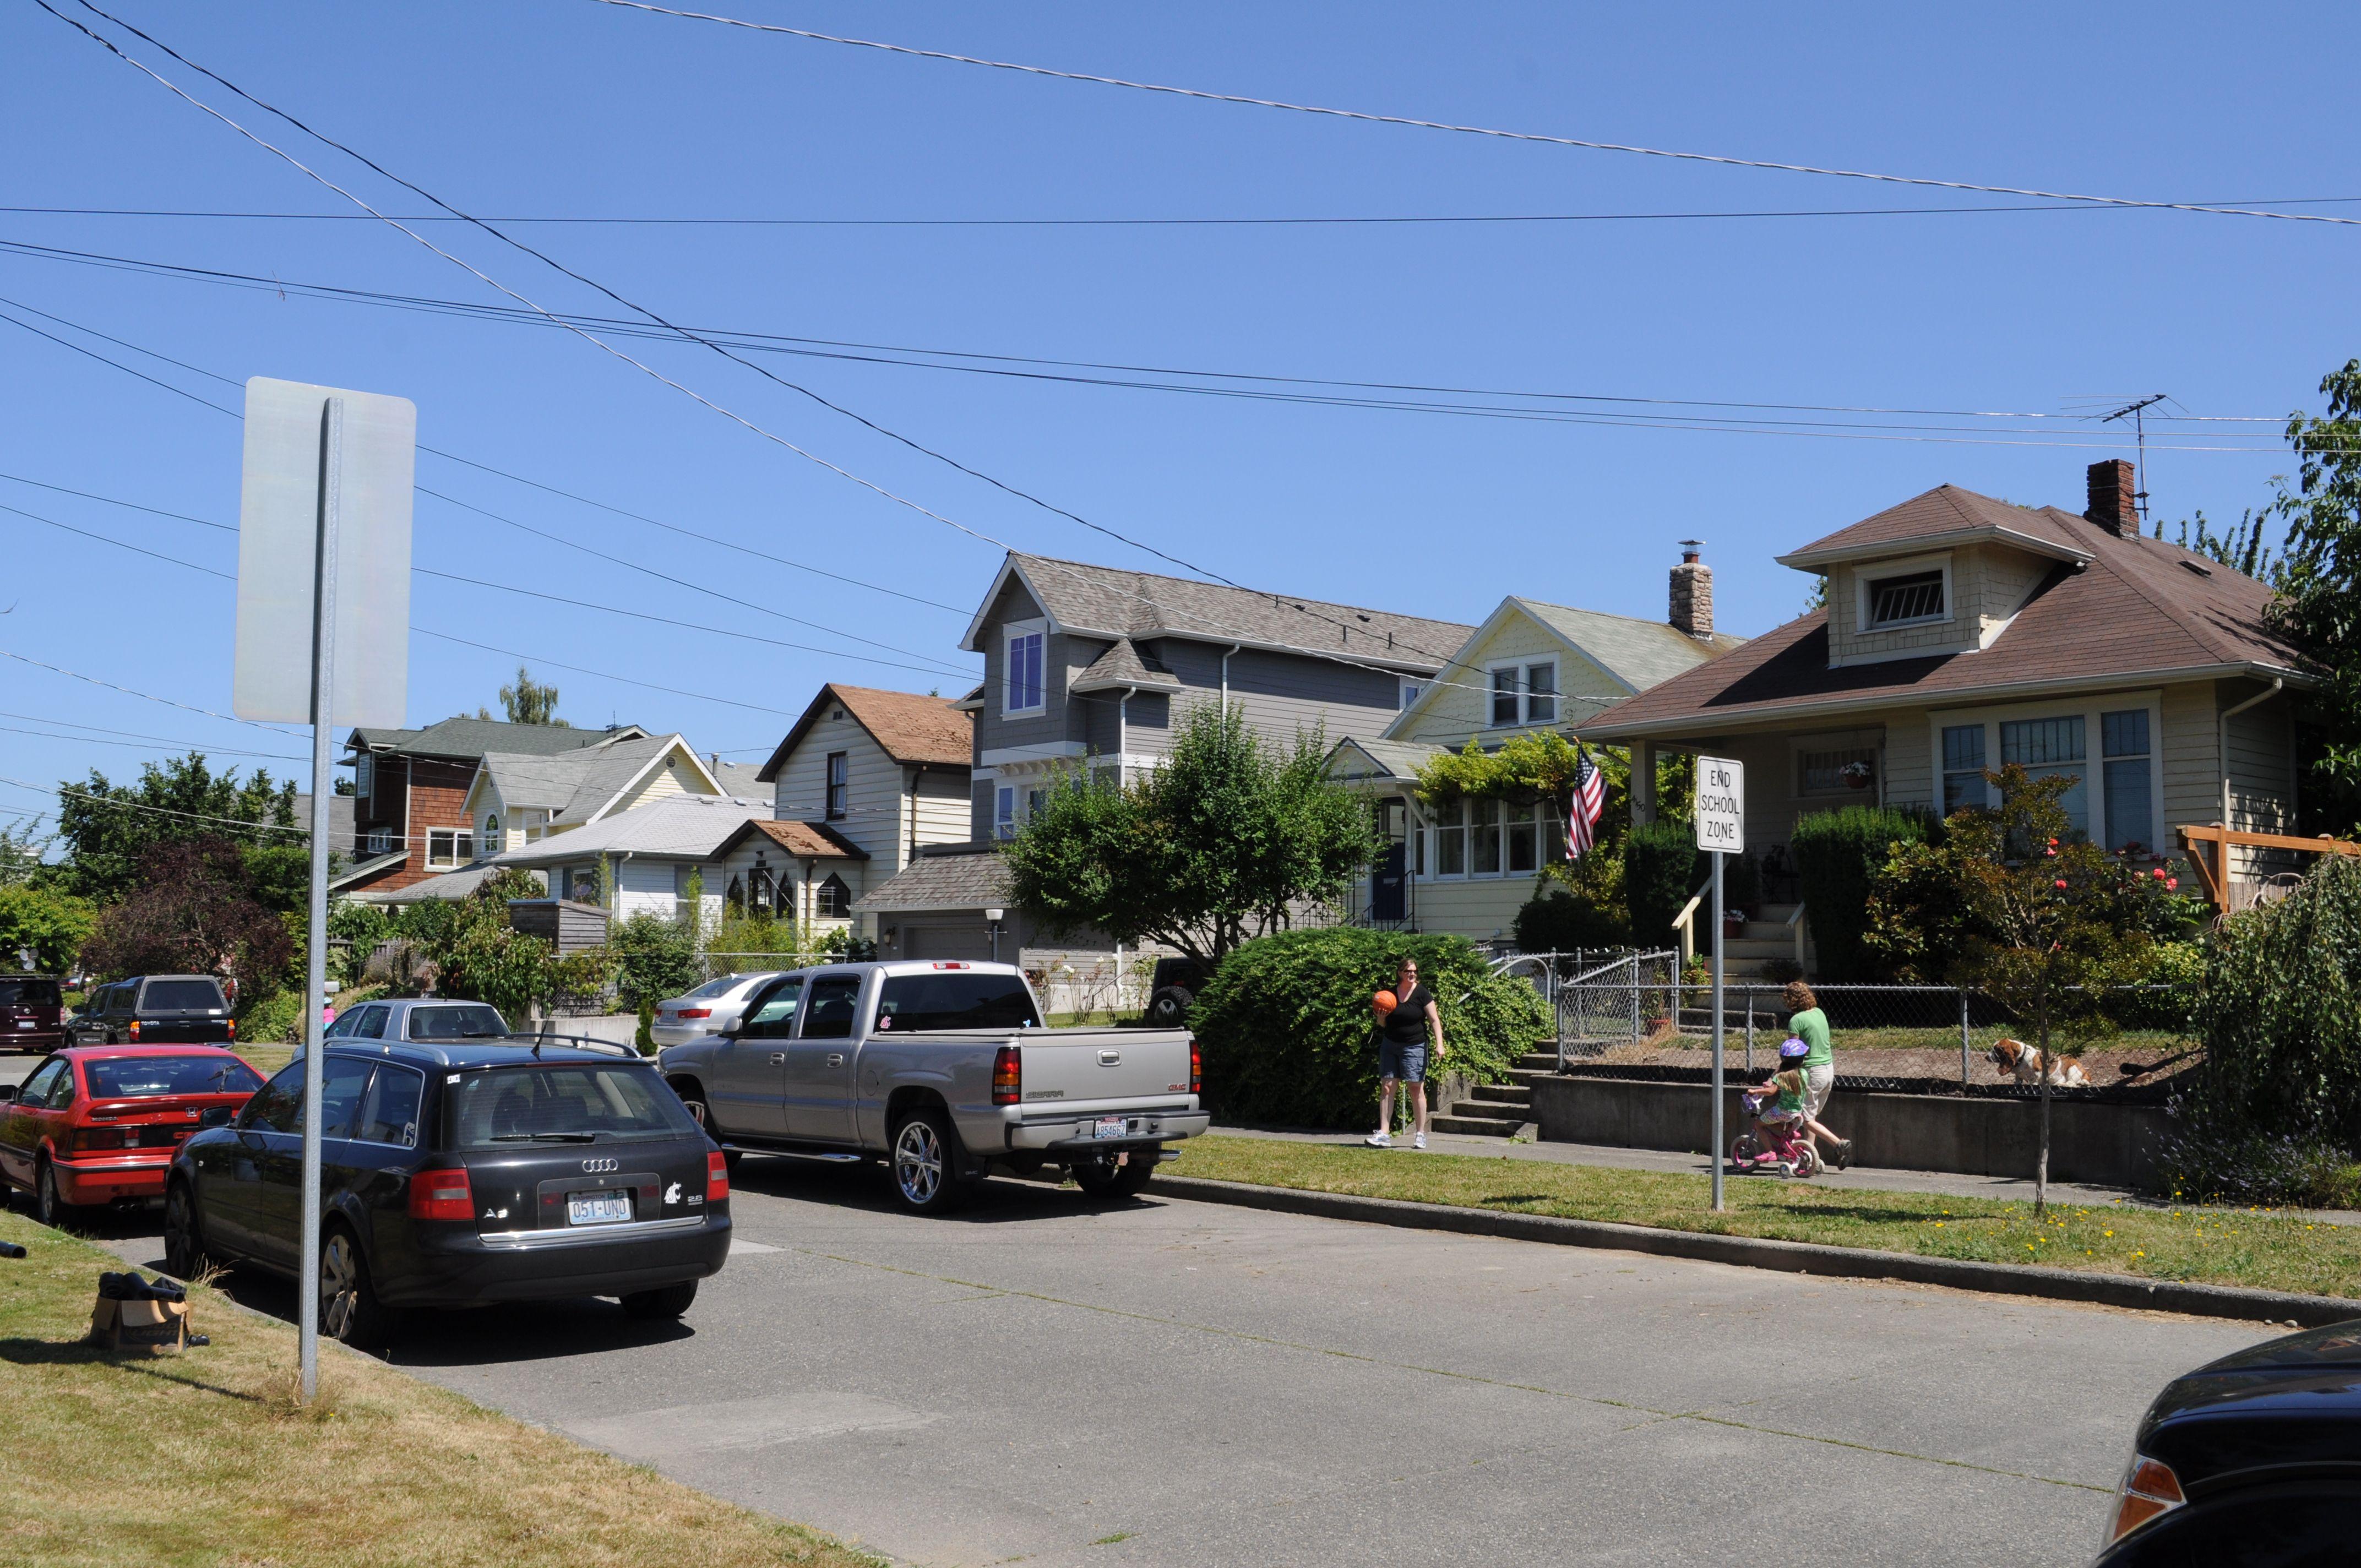 Seattle__Pigeon_Point_neighborhood_27.jpg (4288×2848